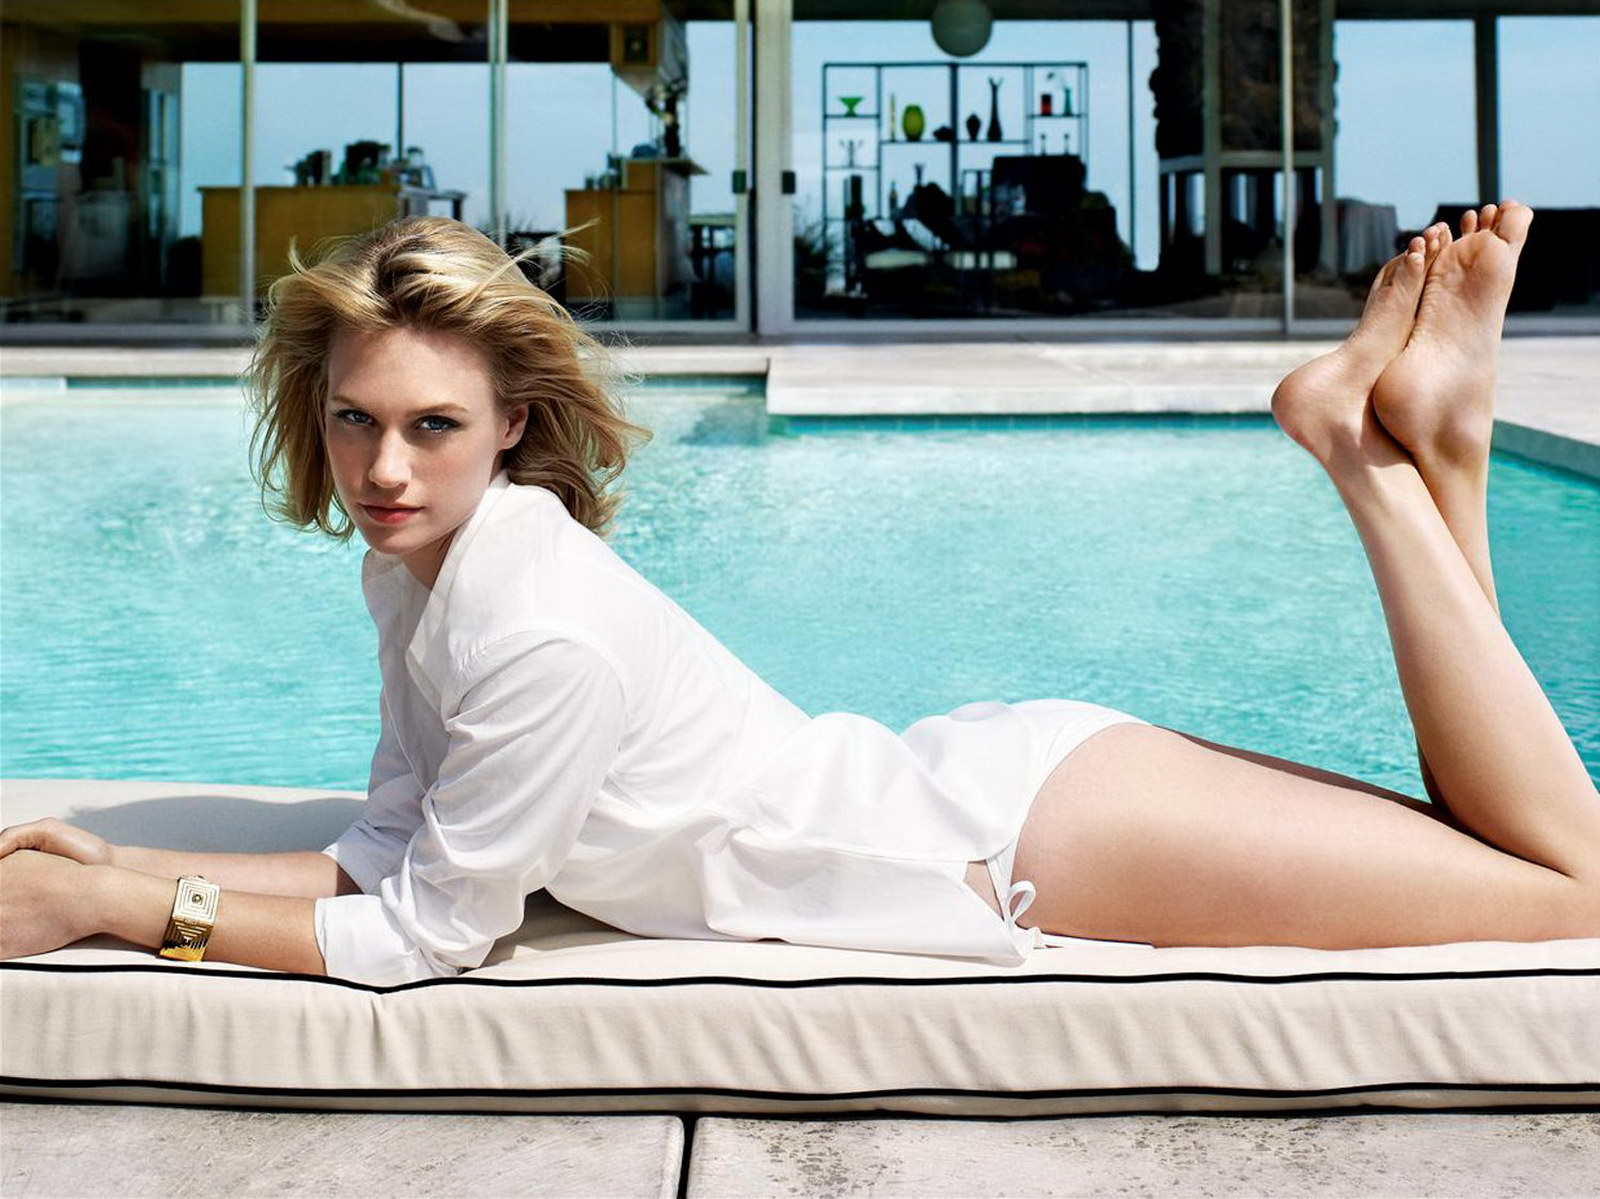 http://4.bp.blogspot.com/_NRGPIrDtEg8/TRC-s1VWIvI/AAAAAAAAAgk/Jh_VD7mOLBw/s1600/January_Jones_sexy_whit_bikini_Pamela_Hanson_1.jpg